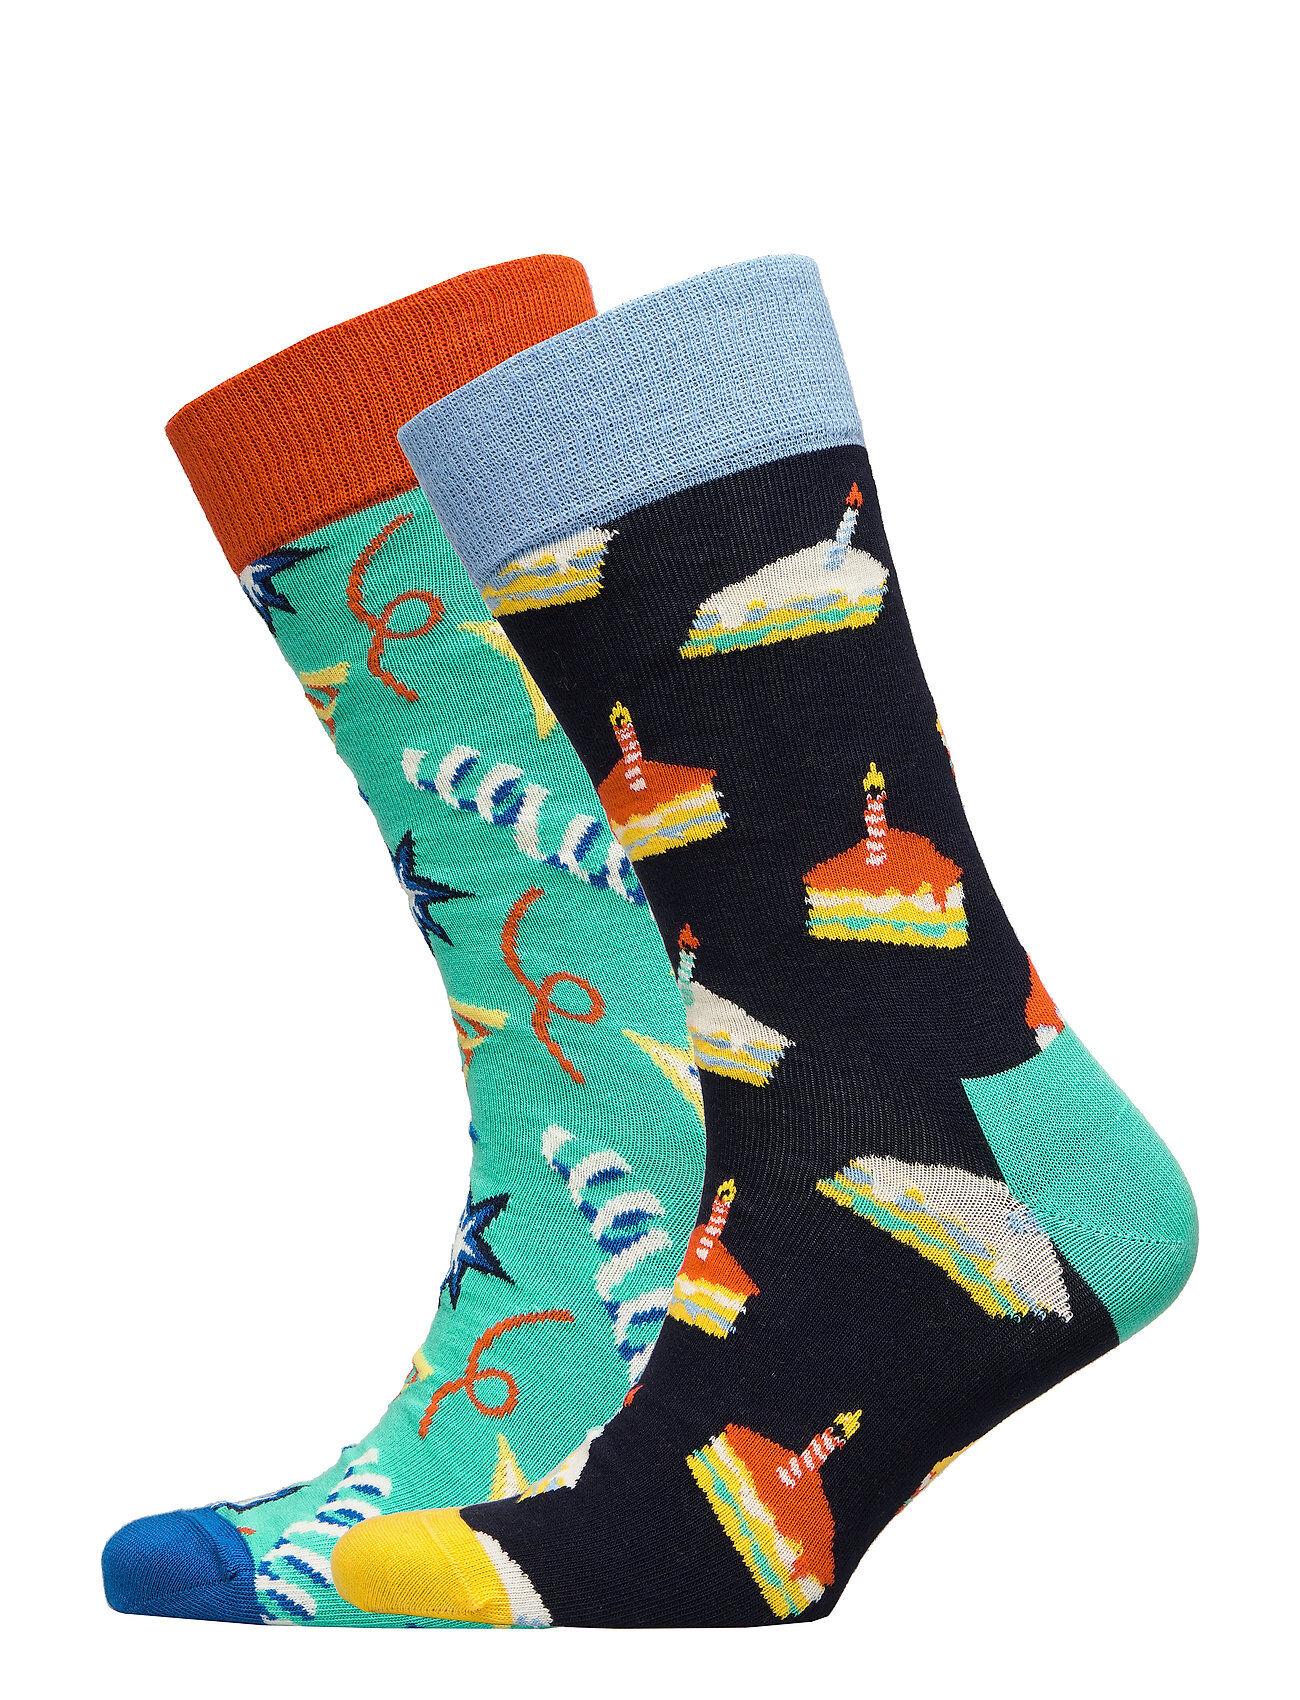 Happy Socks Birthday Gift Box Underwear Socks Regular Socks Monivärinen/Kuvioitu Happy Socks